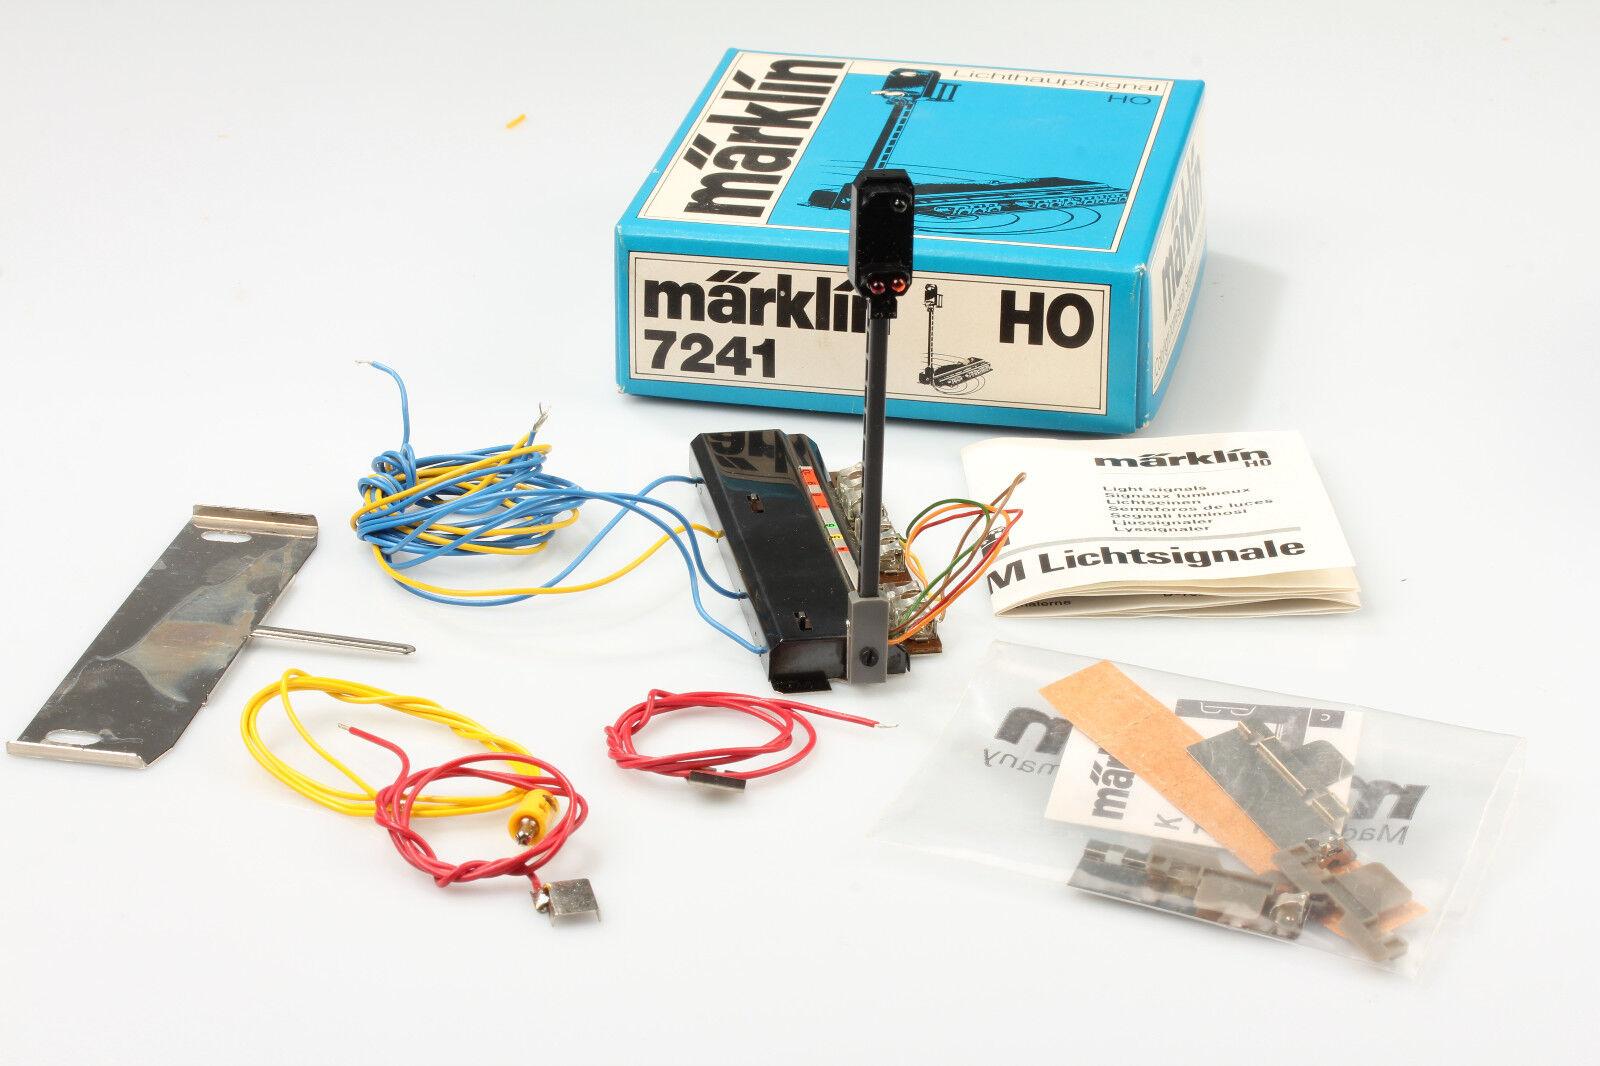 H0   7241 Semaforo Principale Test Ok  Schrankfund Min. Sporco/Graffi